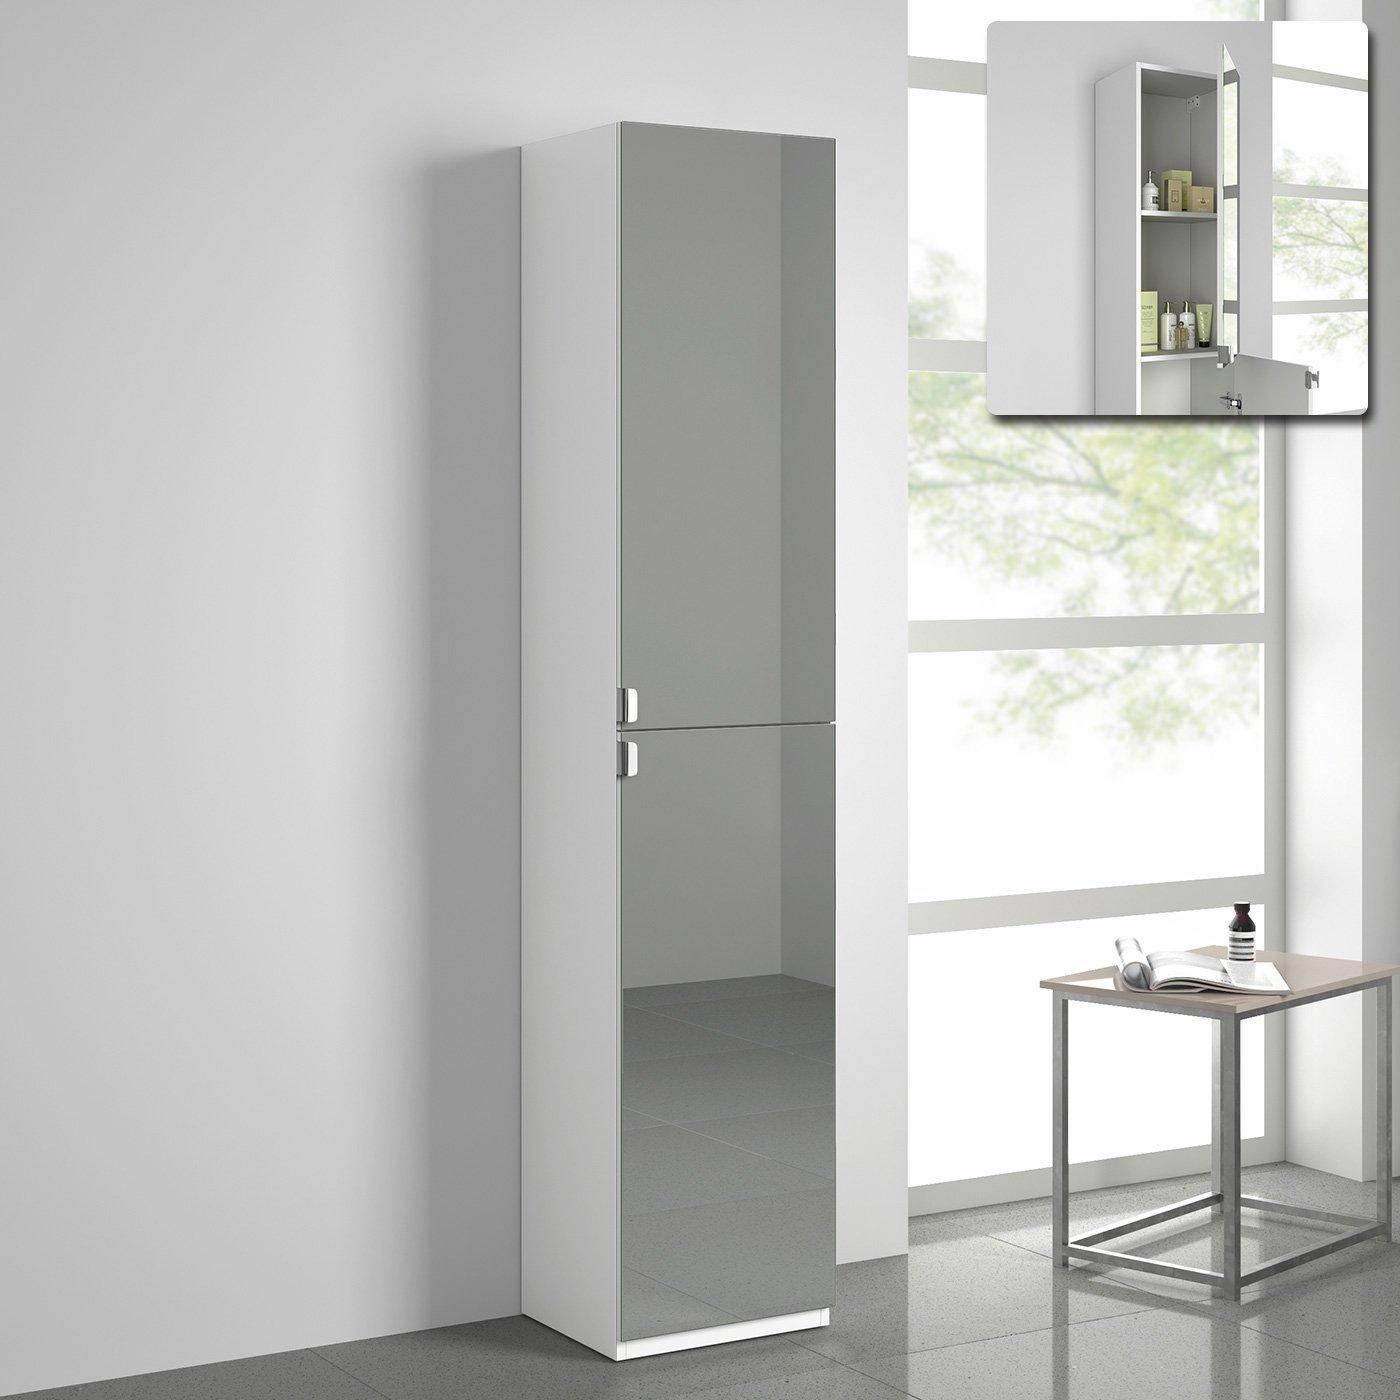 1700mm Tall Bathroom Mirror Cabinet Reversible Cupboard Floor Storage Furniture iBathUK